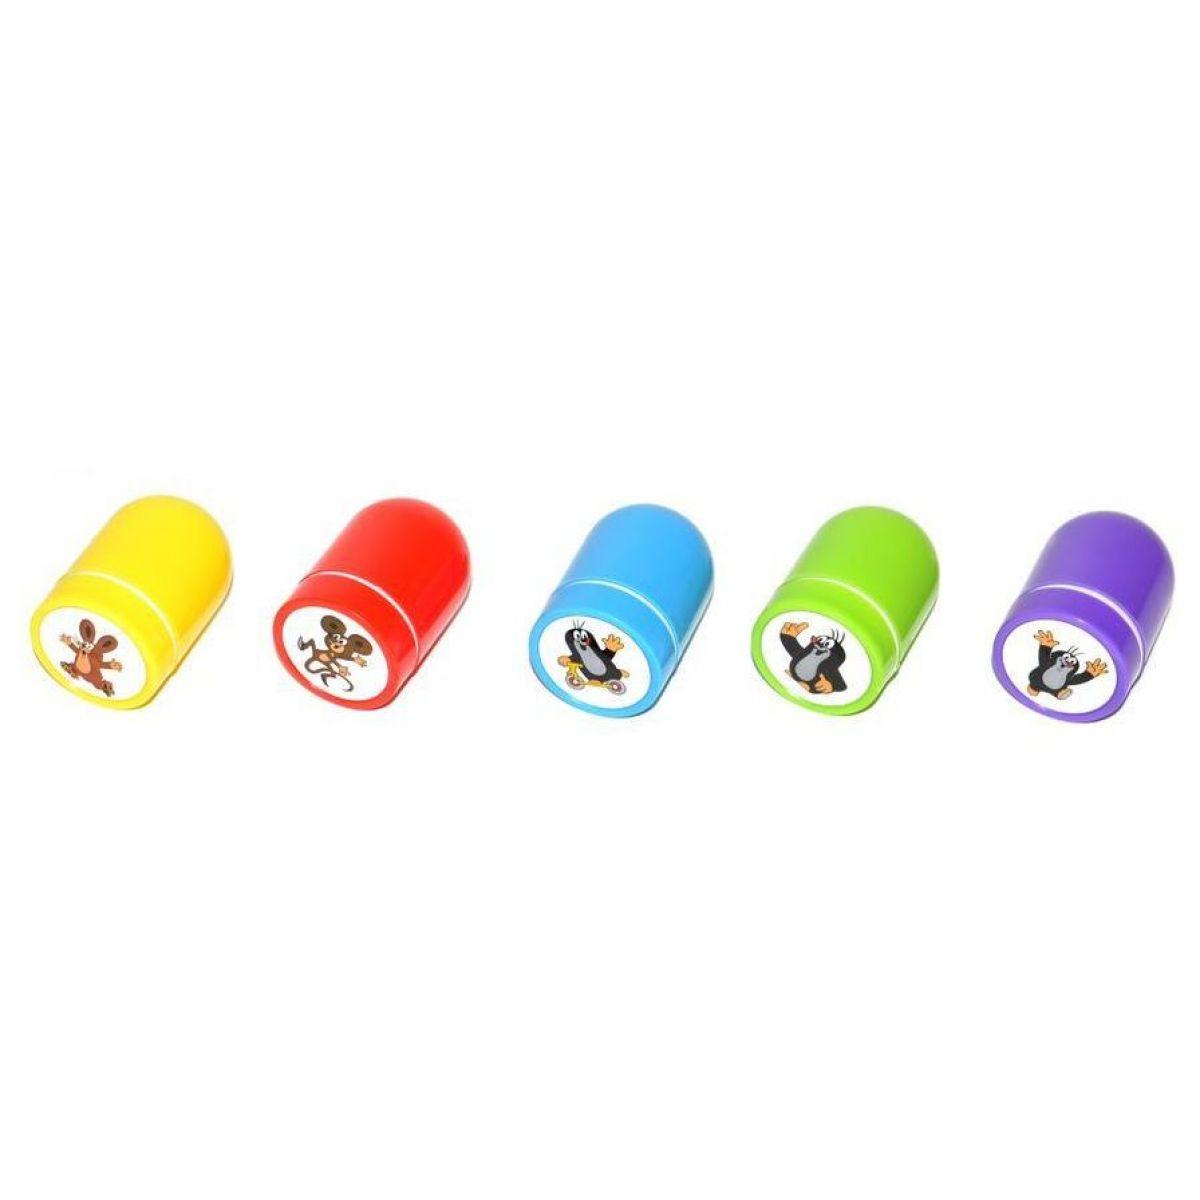 Wiky Pečiatky Krtko 5 farieb